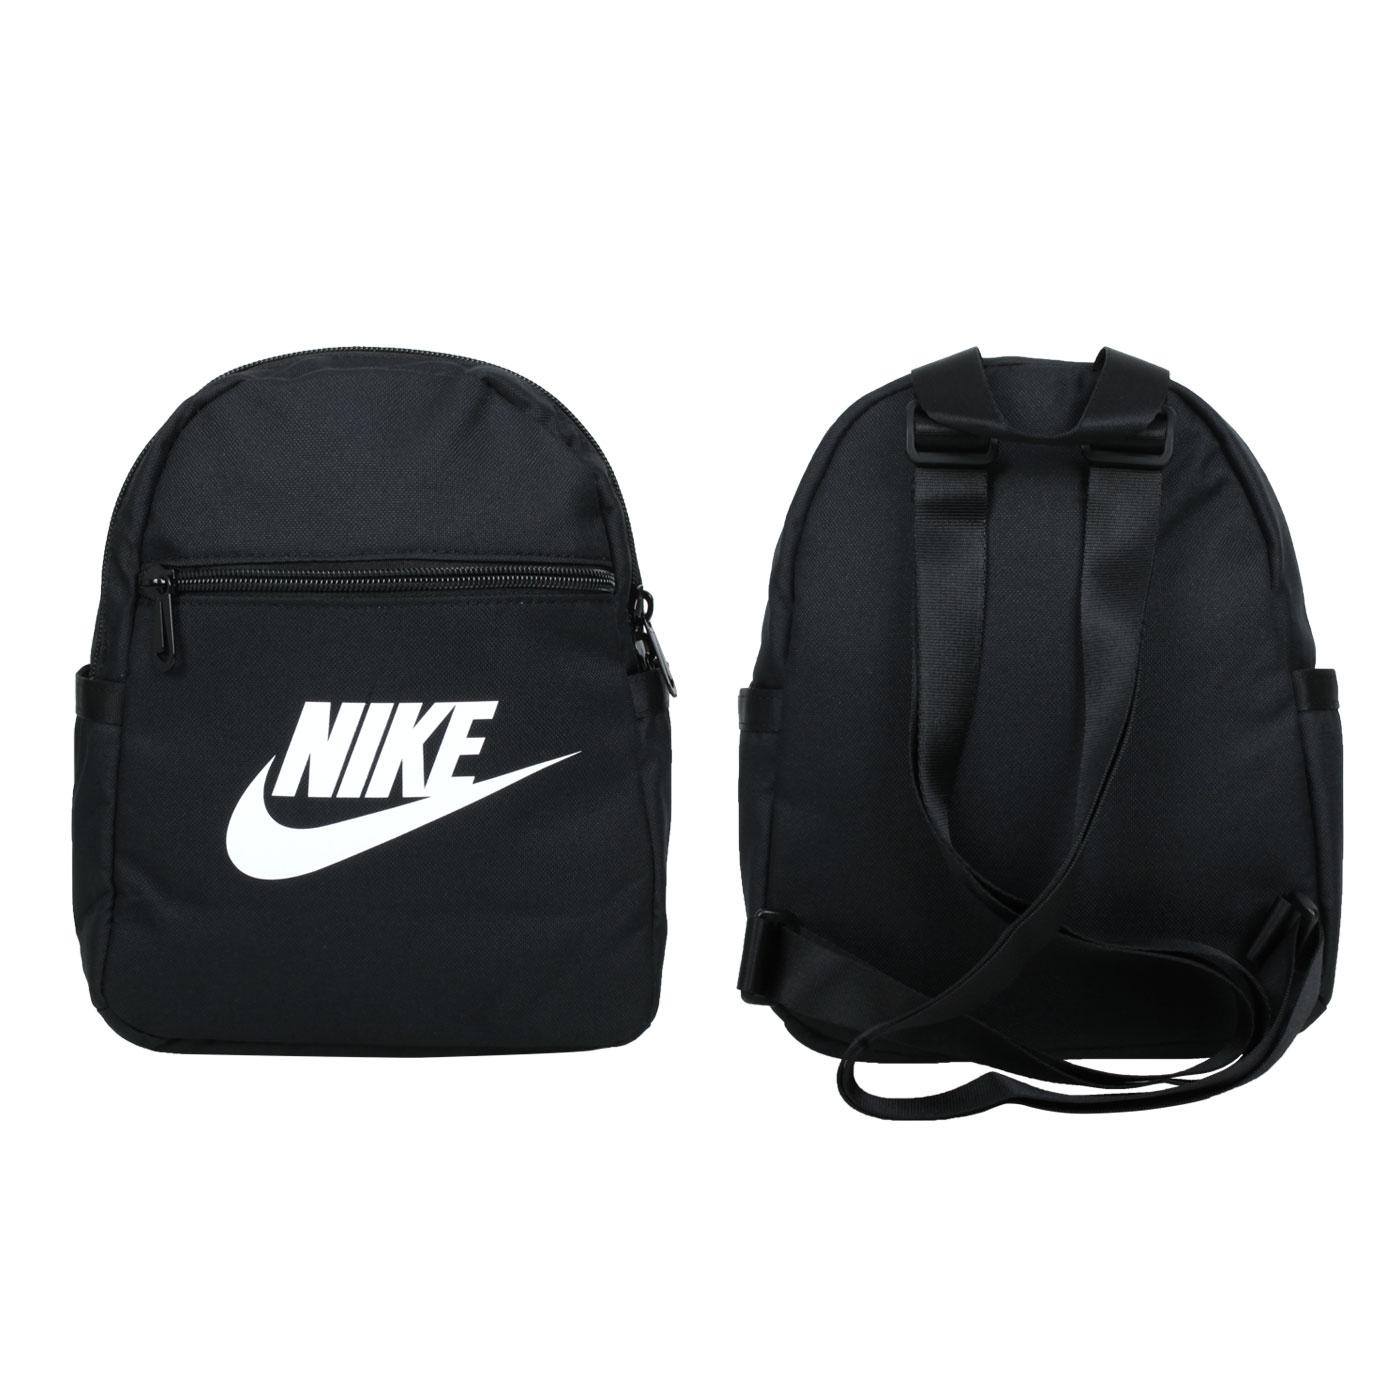 NIKE 小型後背包 CW9301-010 - 黑白